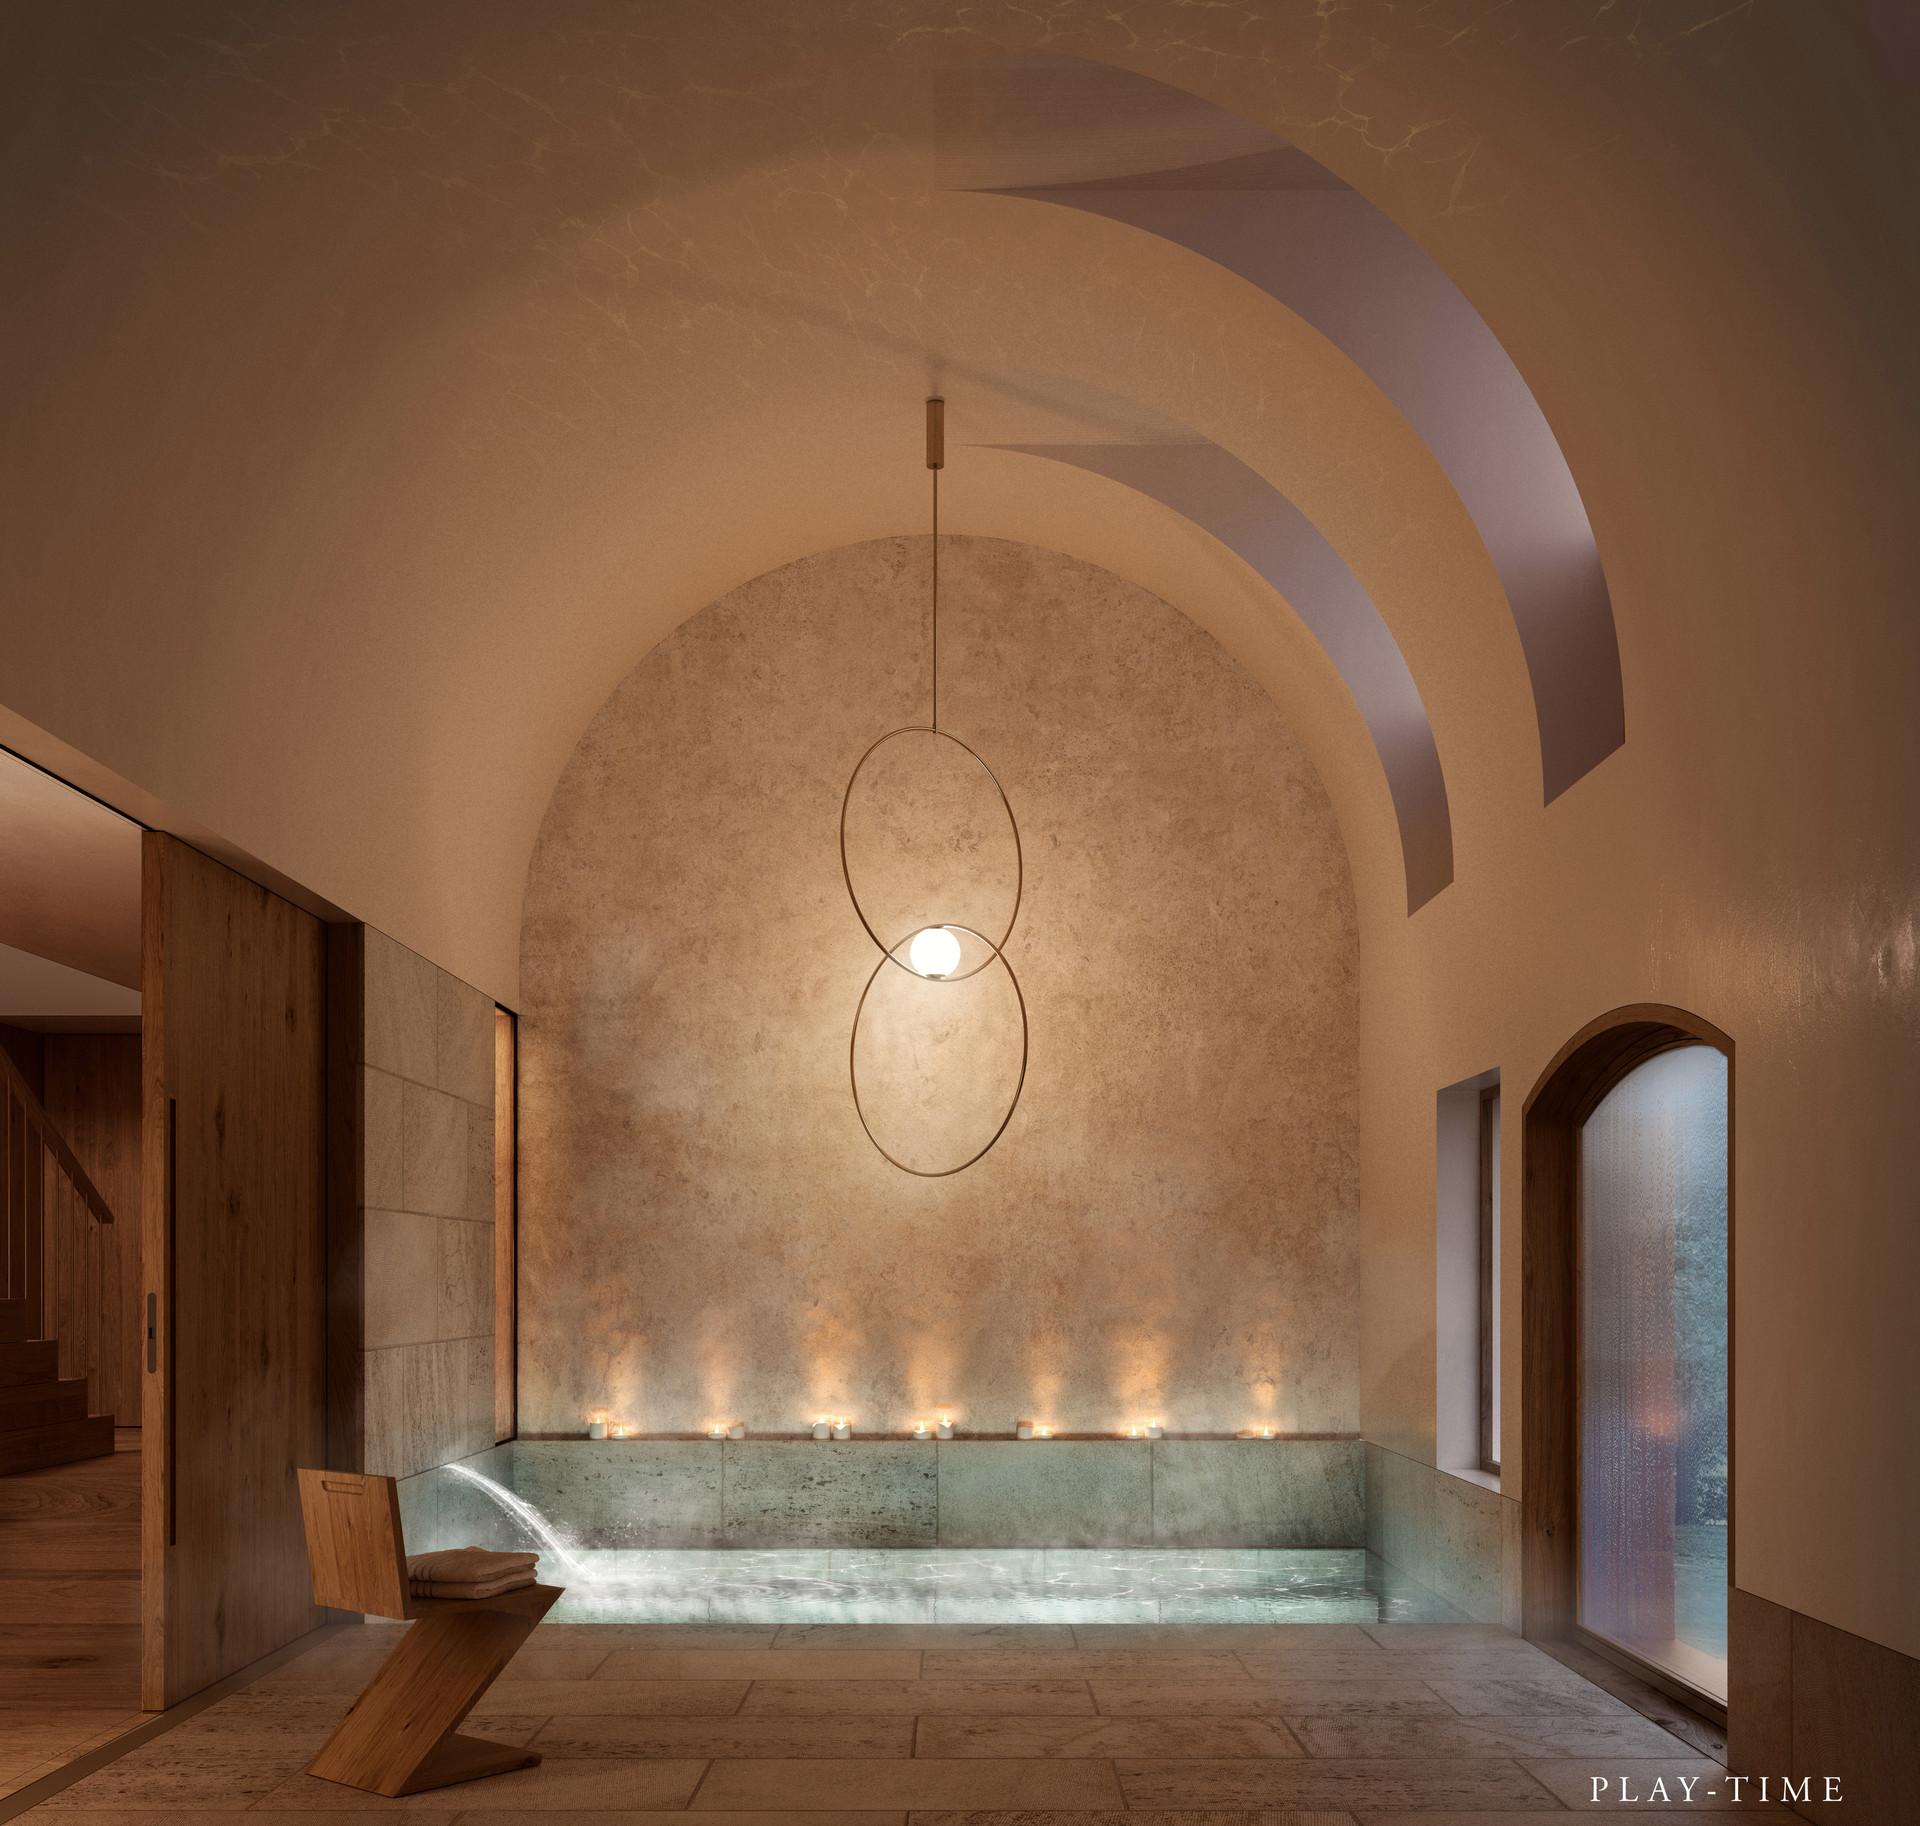 Play time architectonic image mesura house renovation alella 05